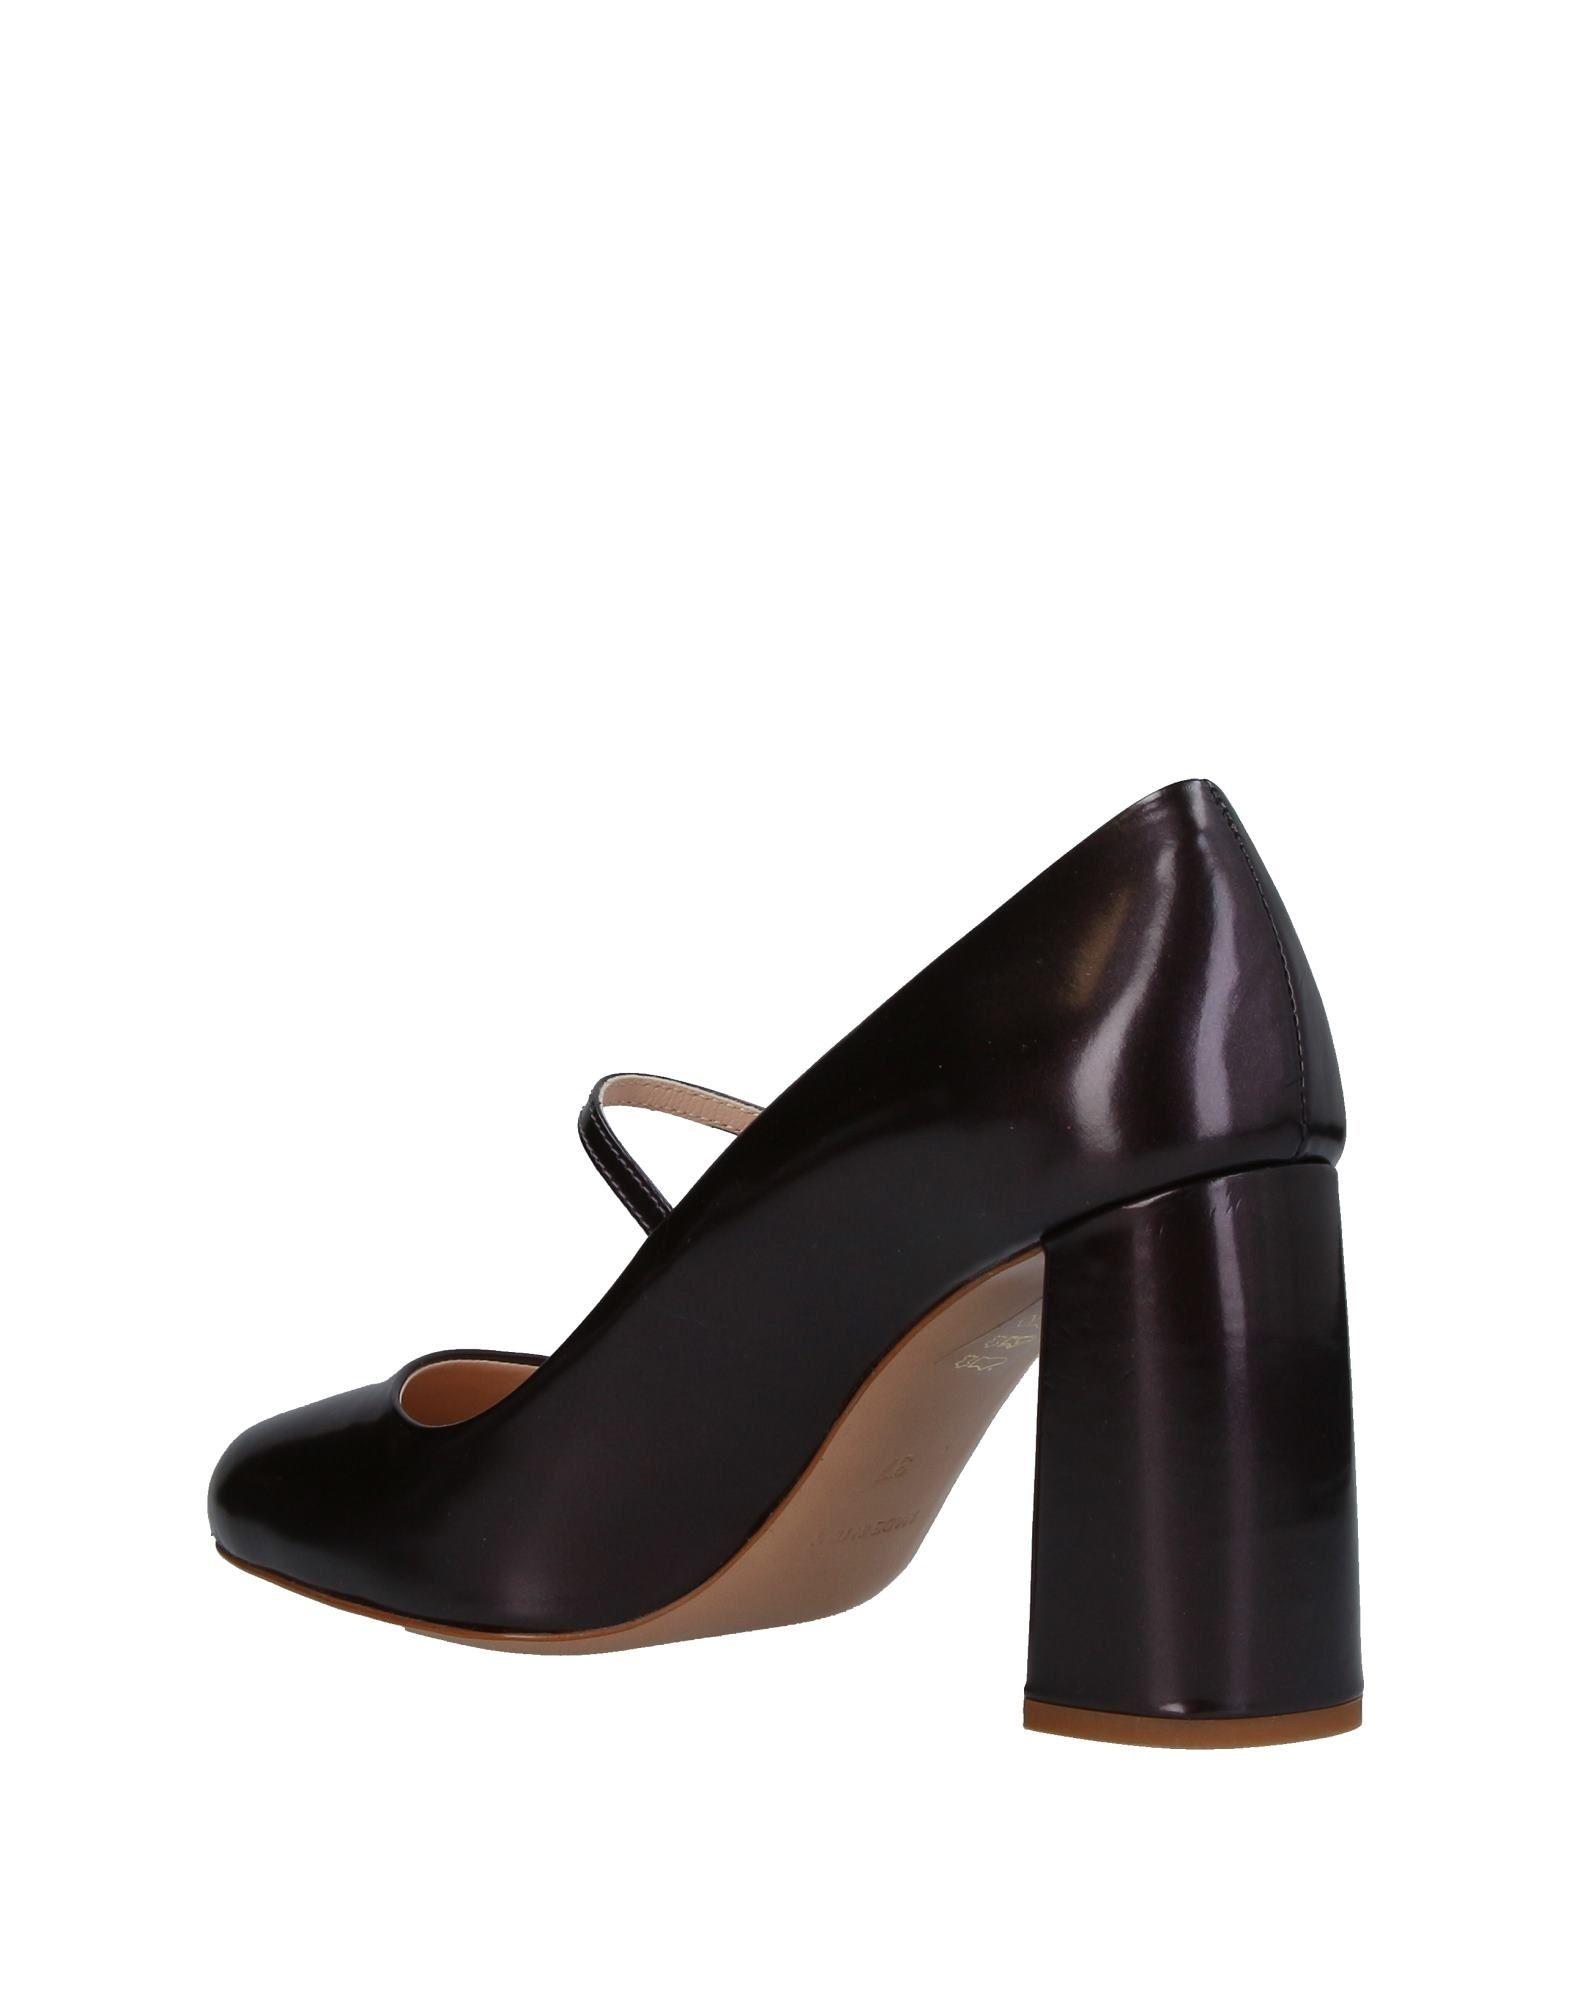 Prezioso Pumps Gute Damen  11414684WG Gute Pumps Qualität beliebte Schuhe 2b56da